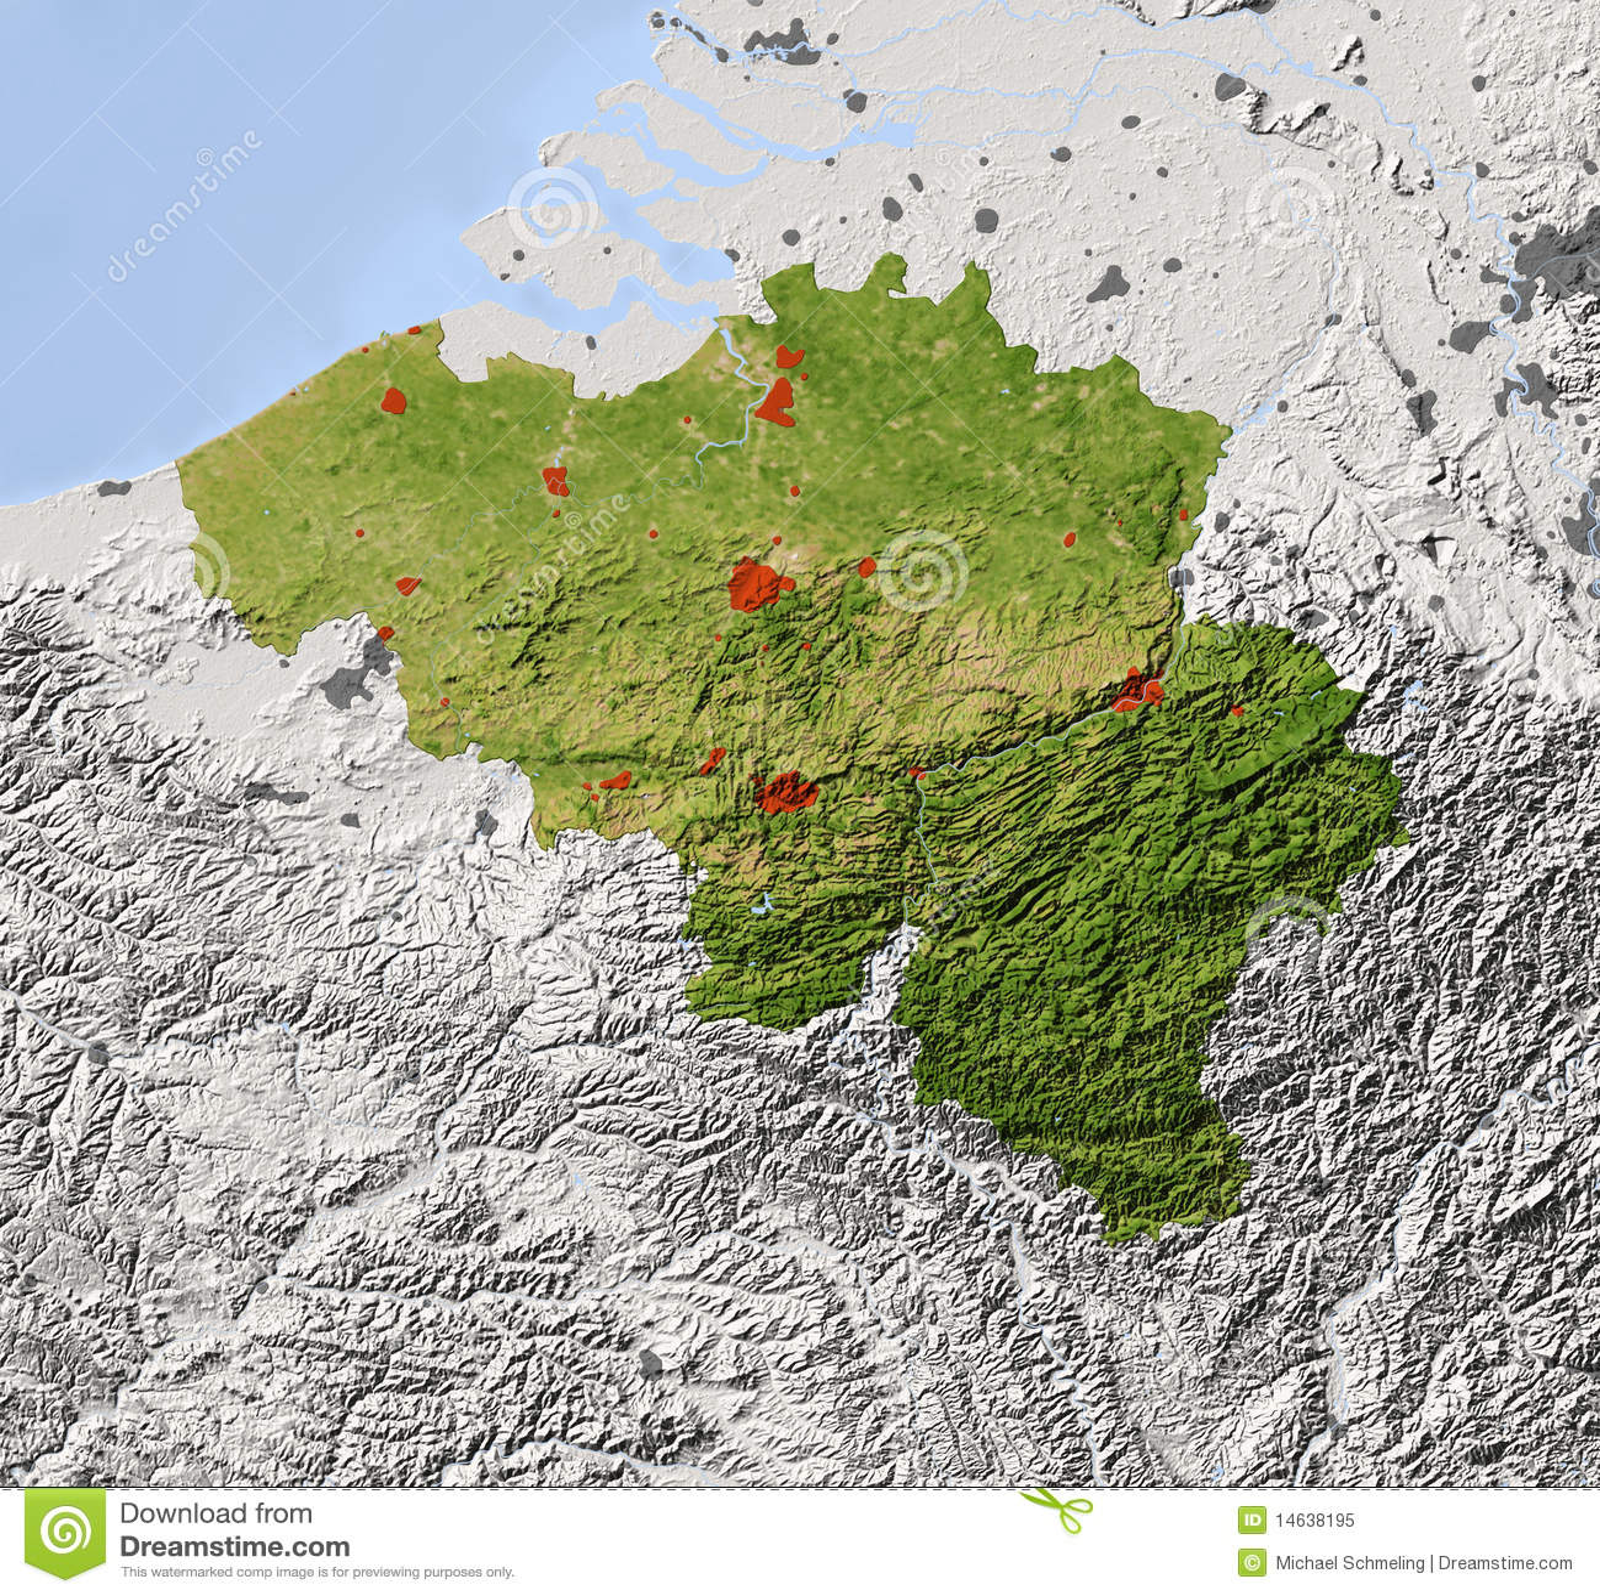 Belgium Topographic Map.Belgium Shaded Relief Map Stock Illustration Illustration Of